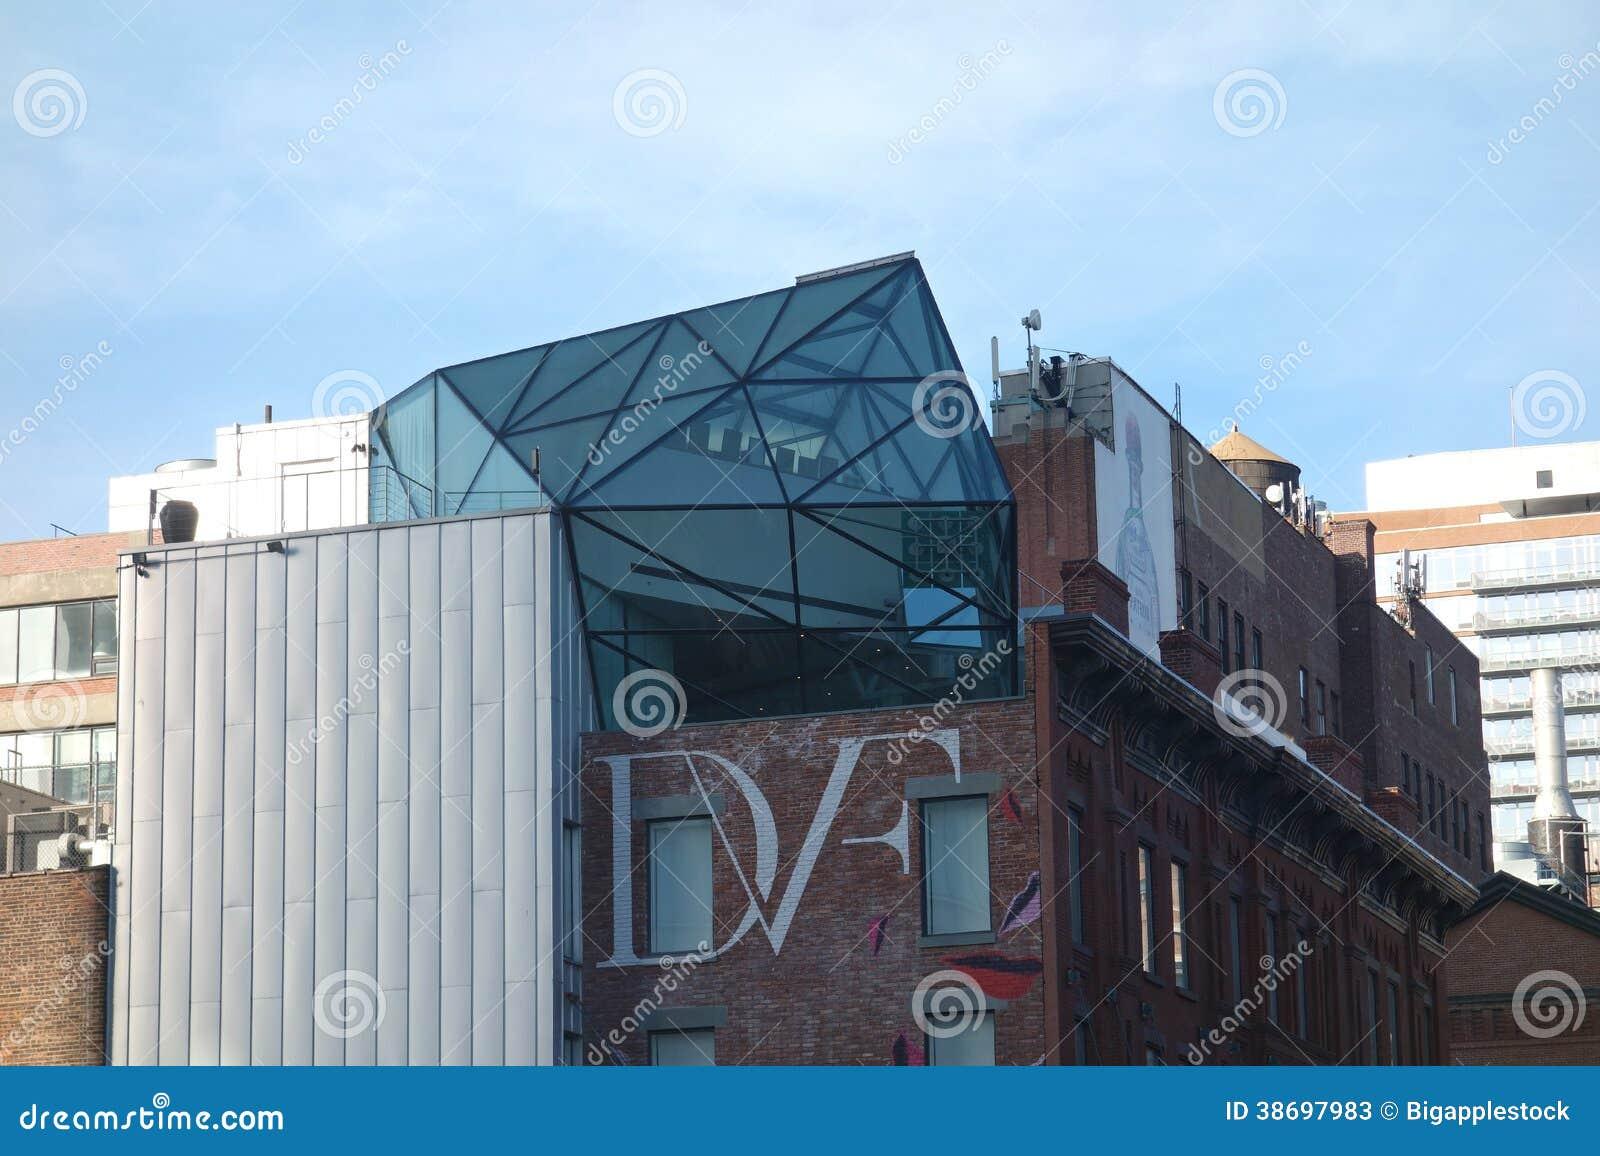 Diane von Furstenberg Studio Headquarters